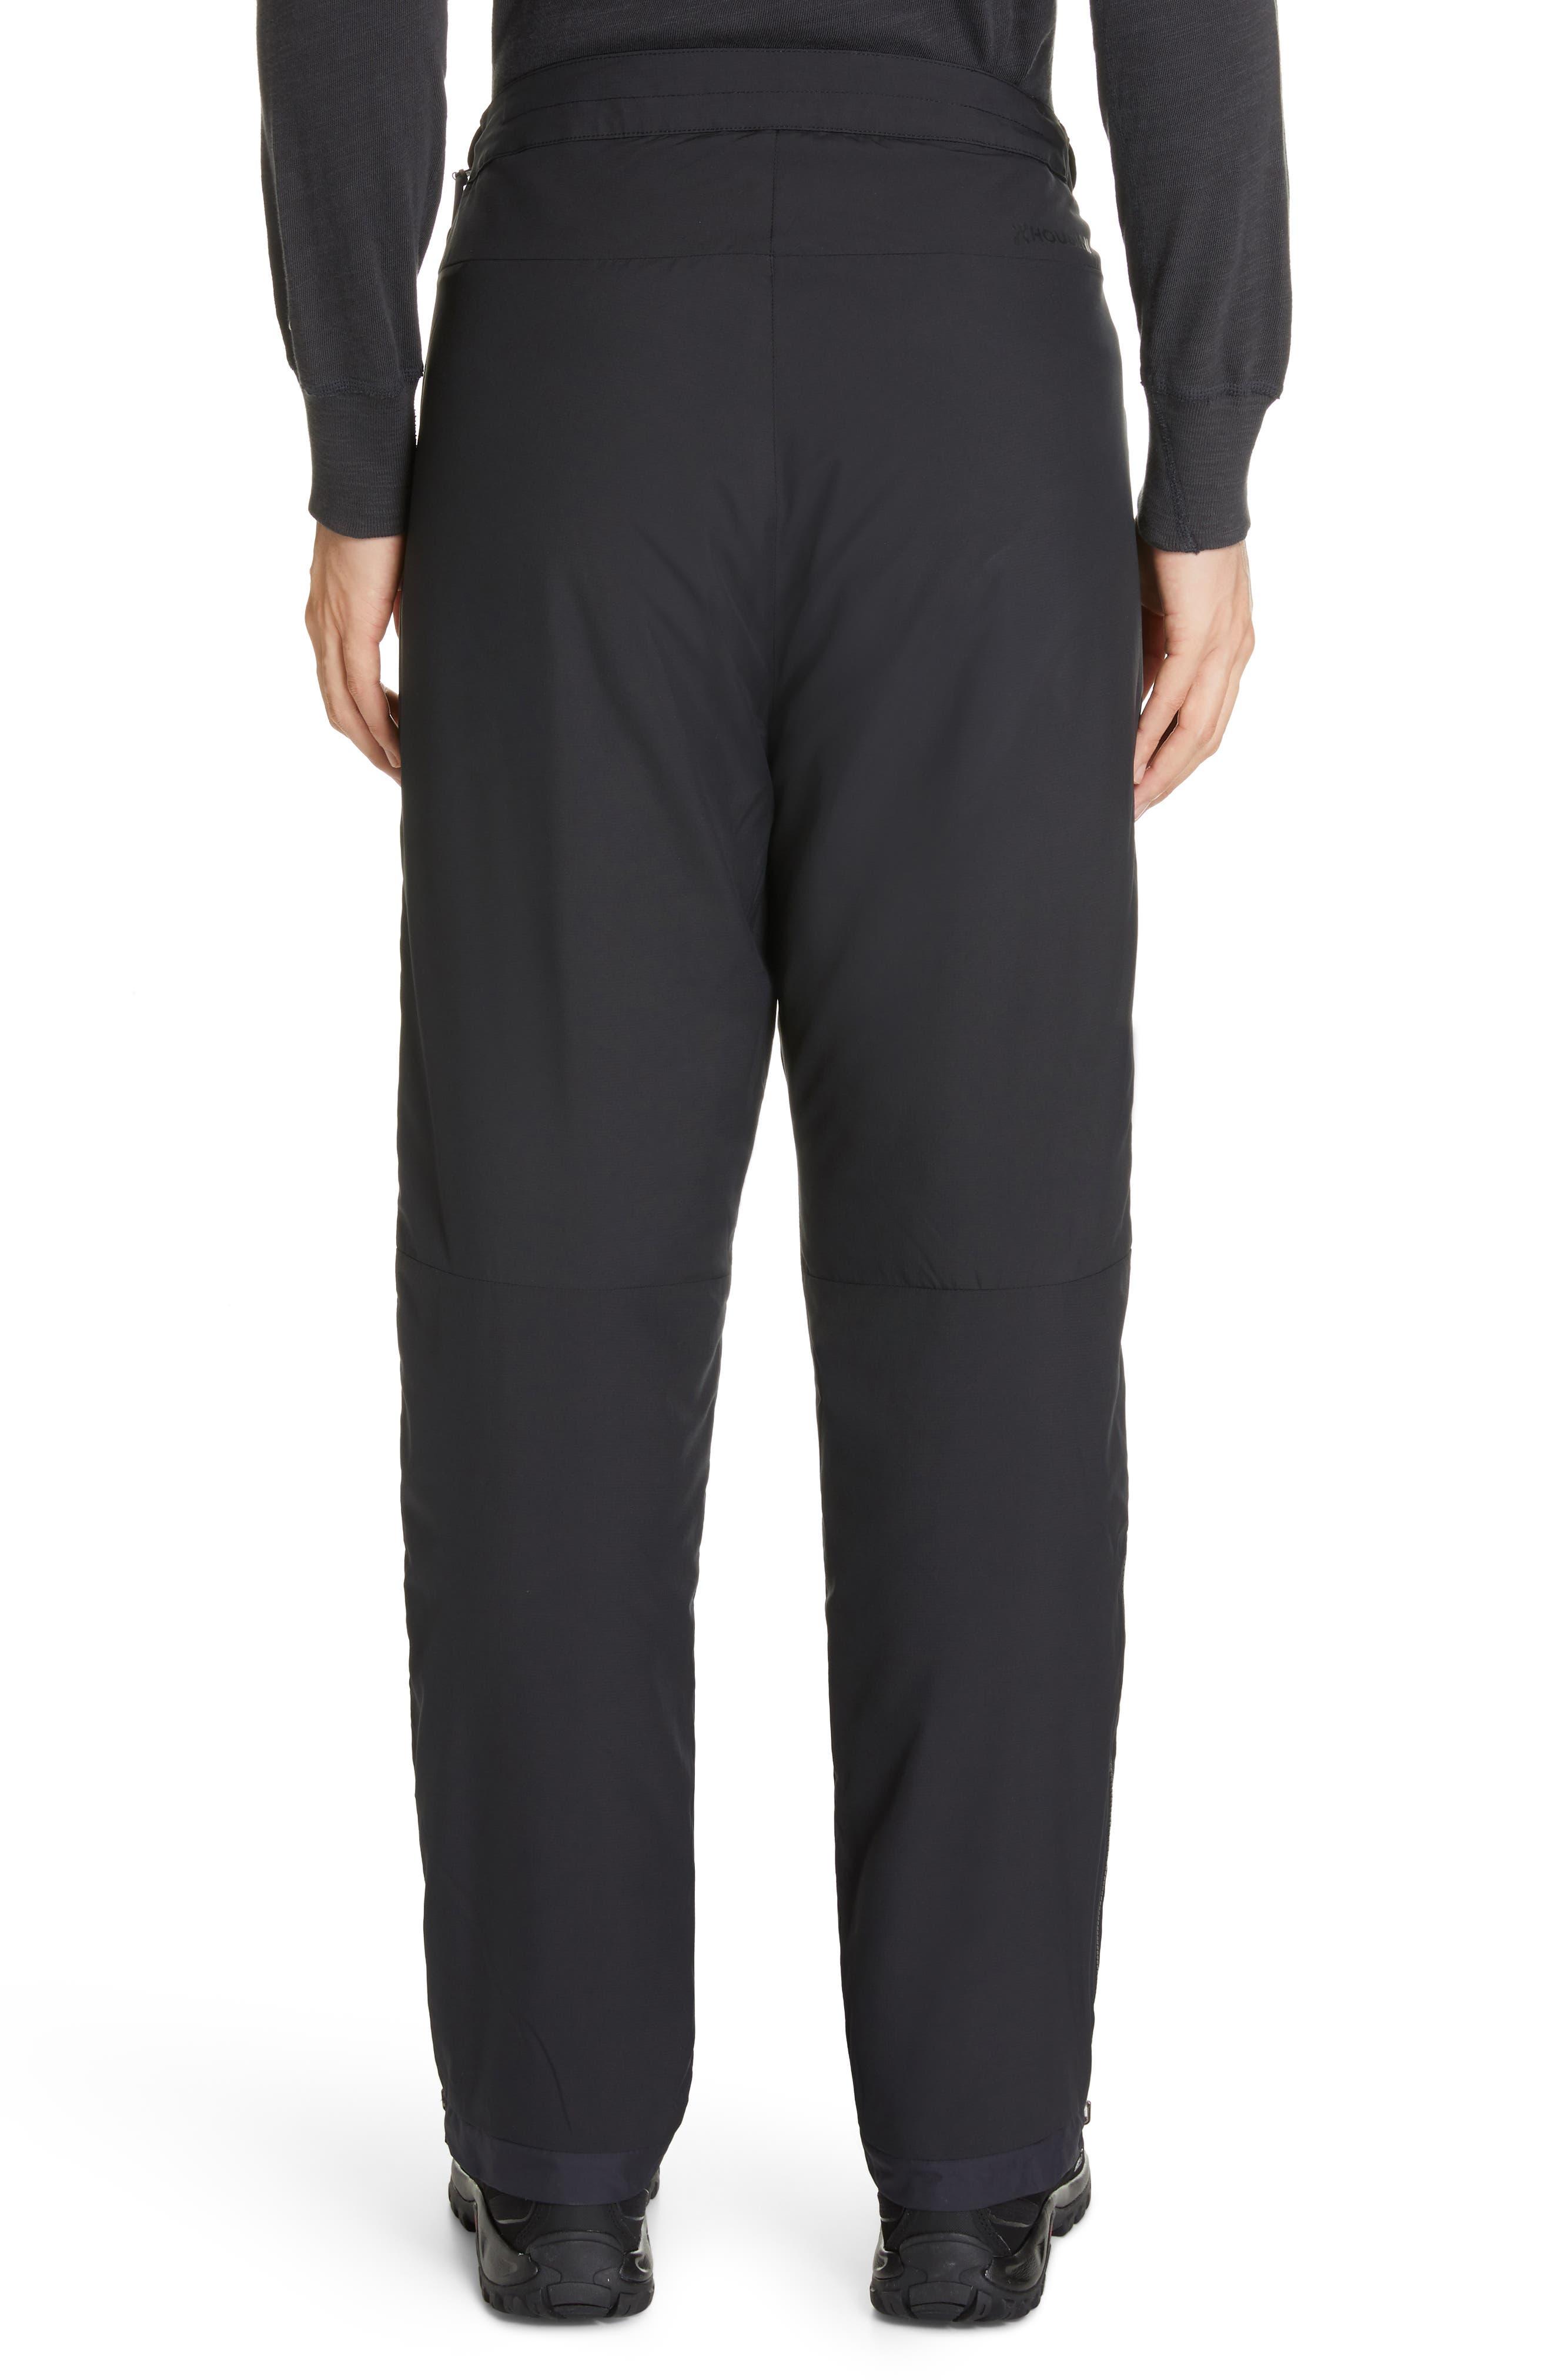 HOUDINI, Ci Insulated Men's Pants, Alternate thumbnail 4, color, 001